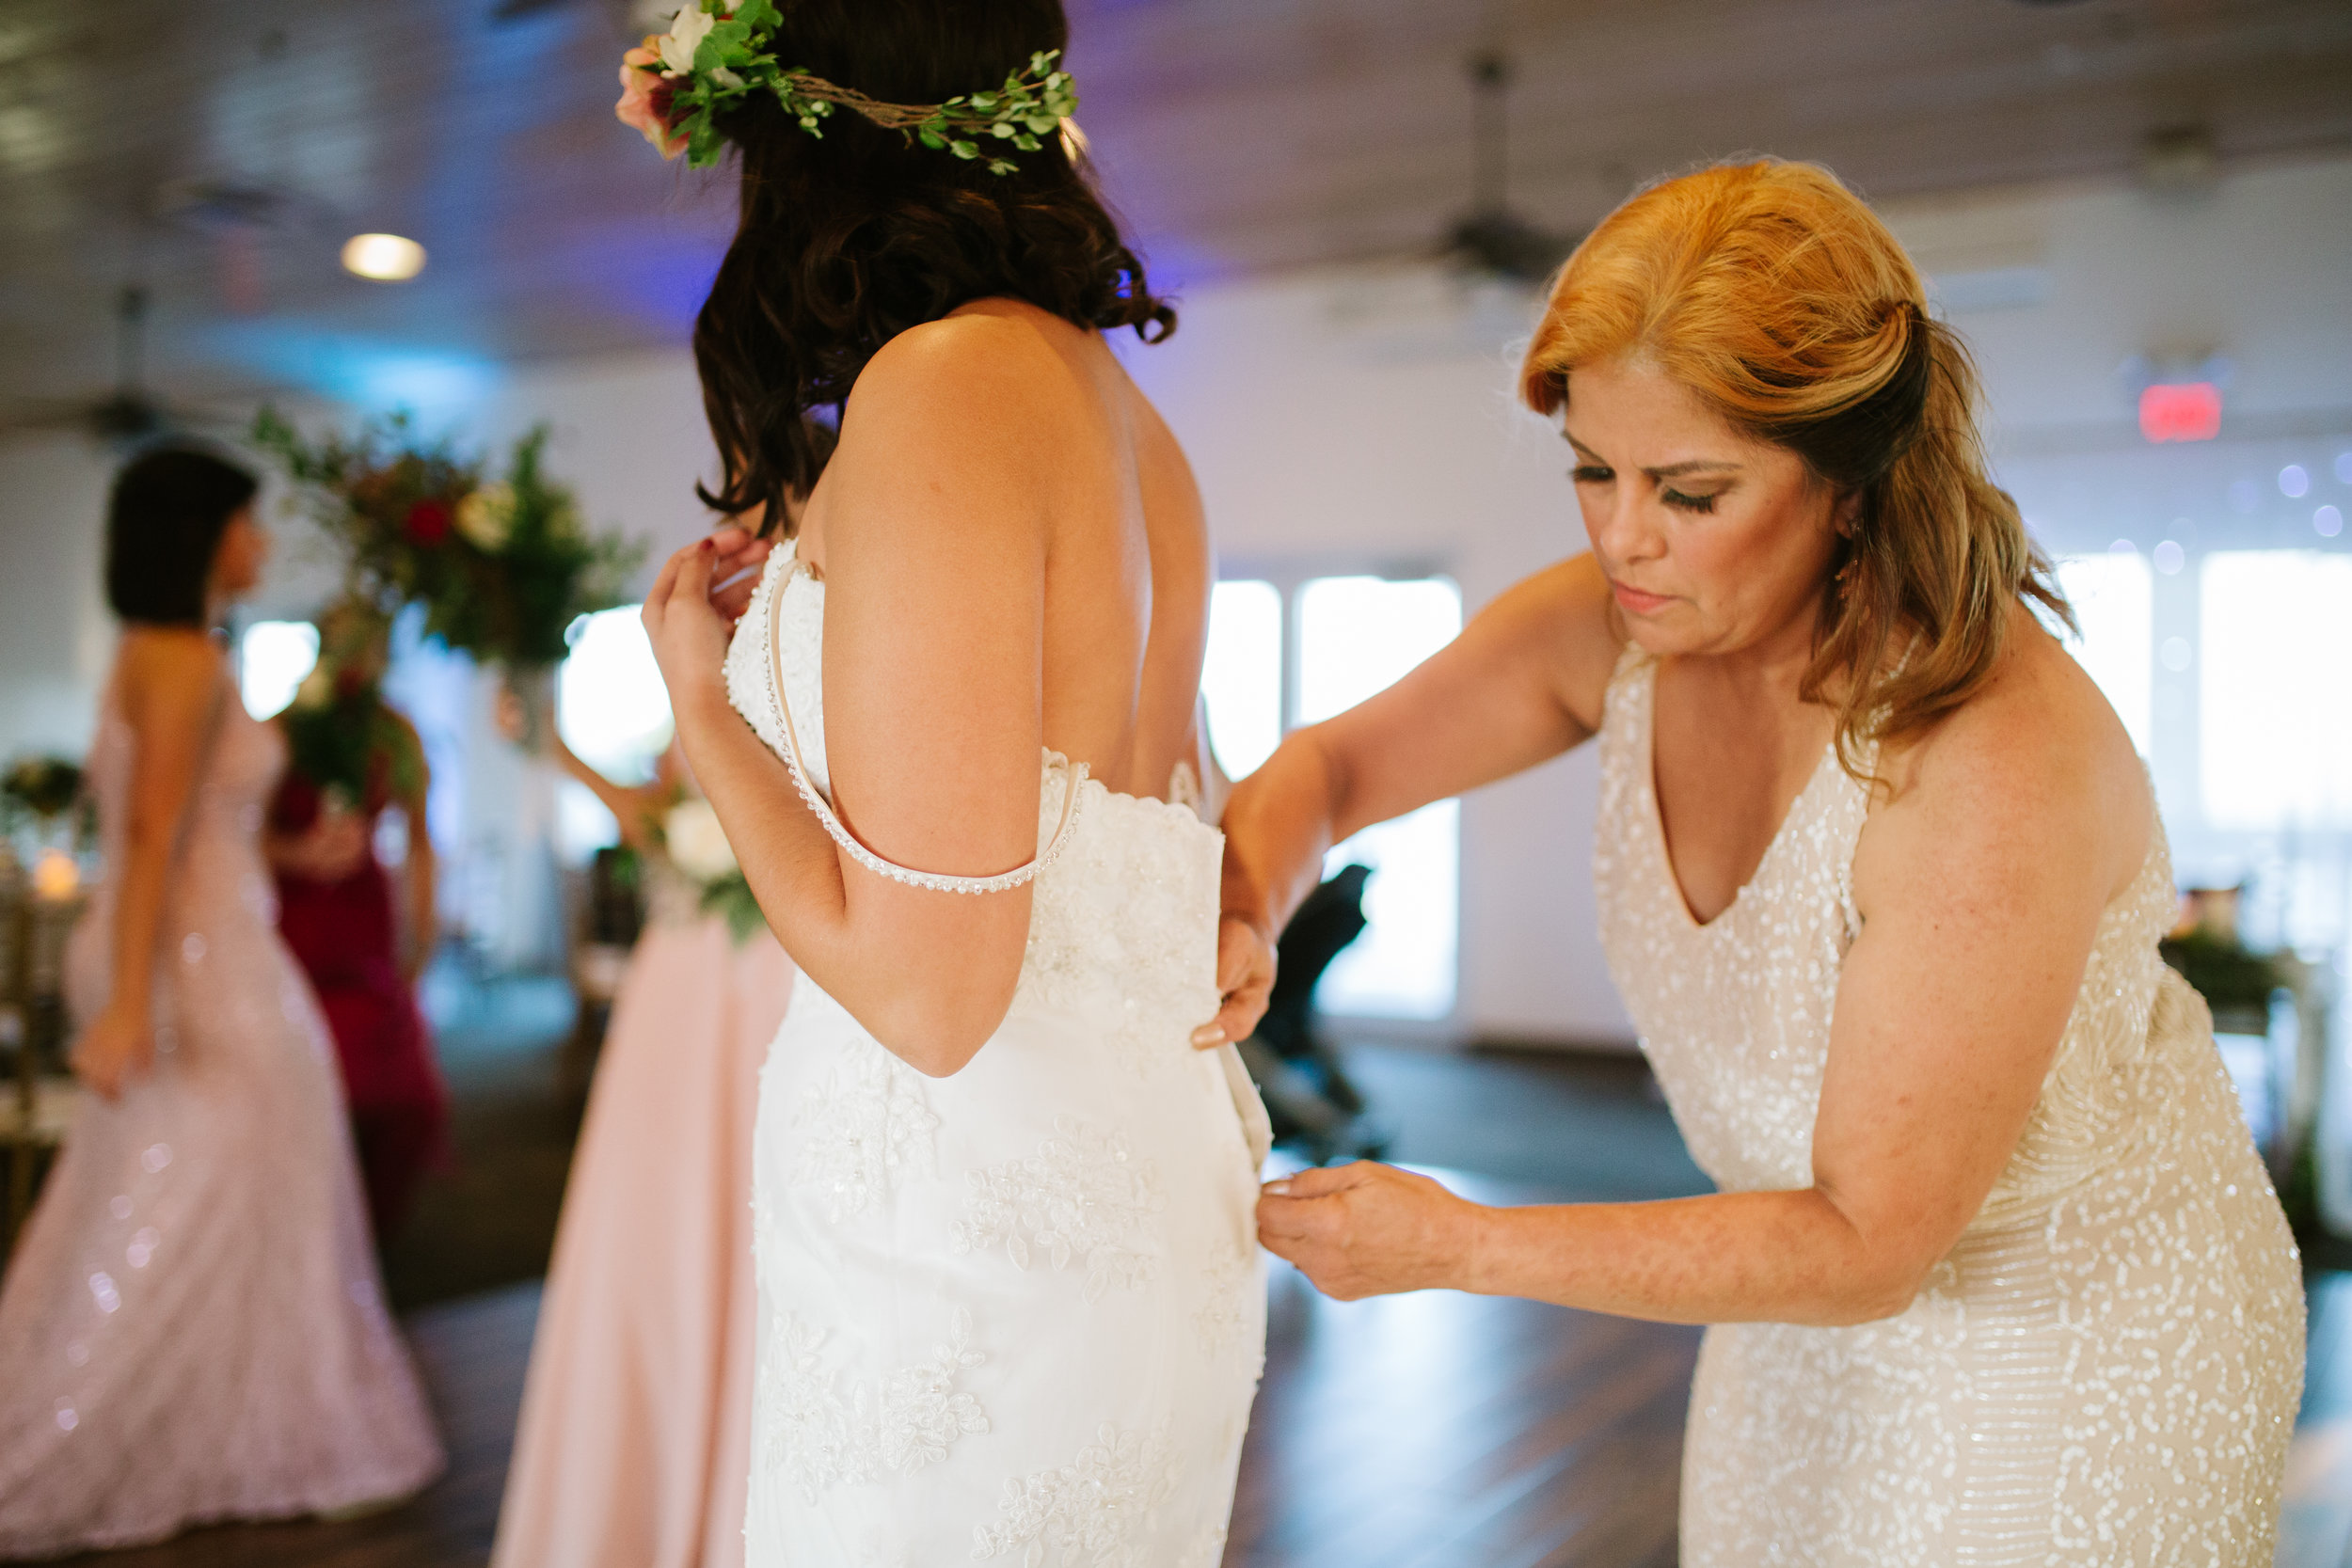 2017.05.23 Barbara and Mauricio Sales Port St Lucie Wedding (280 of 772).jpg